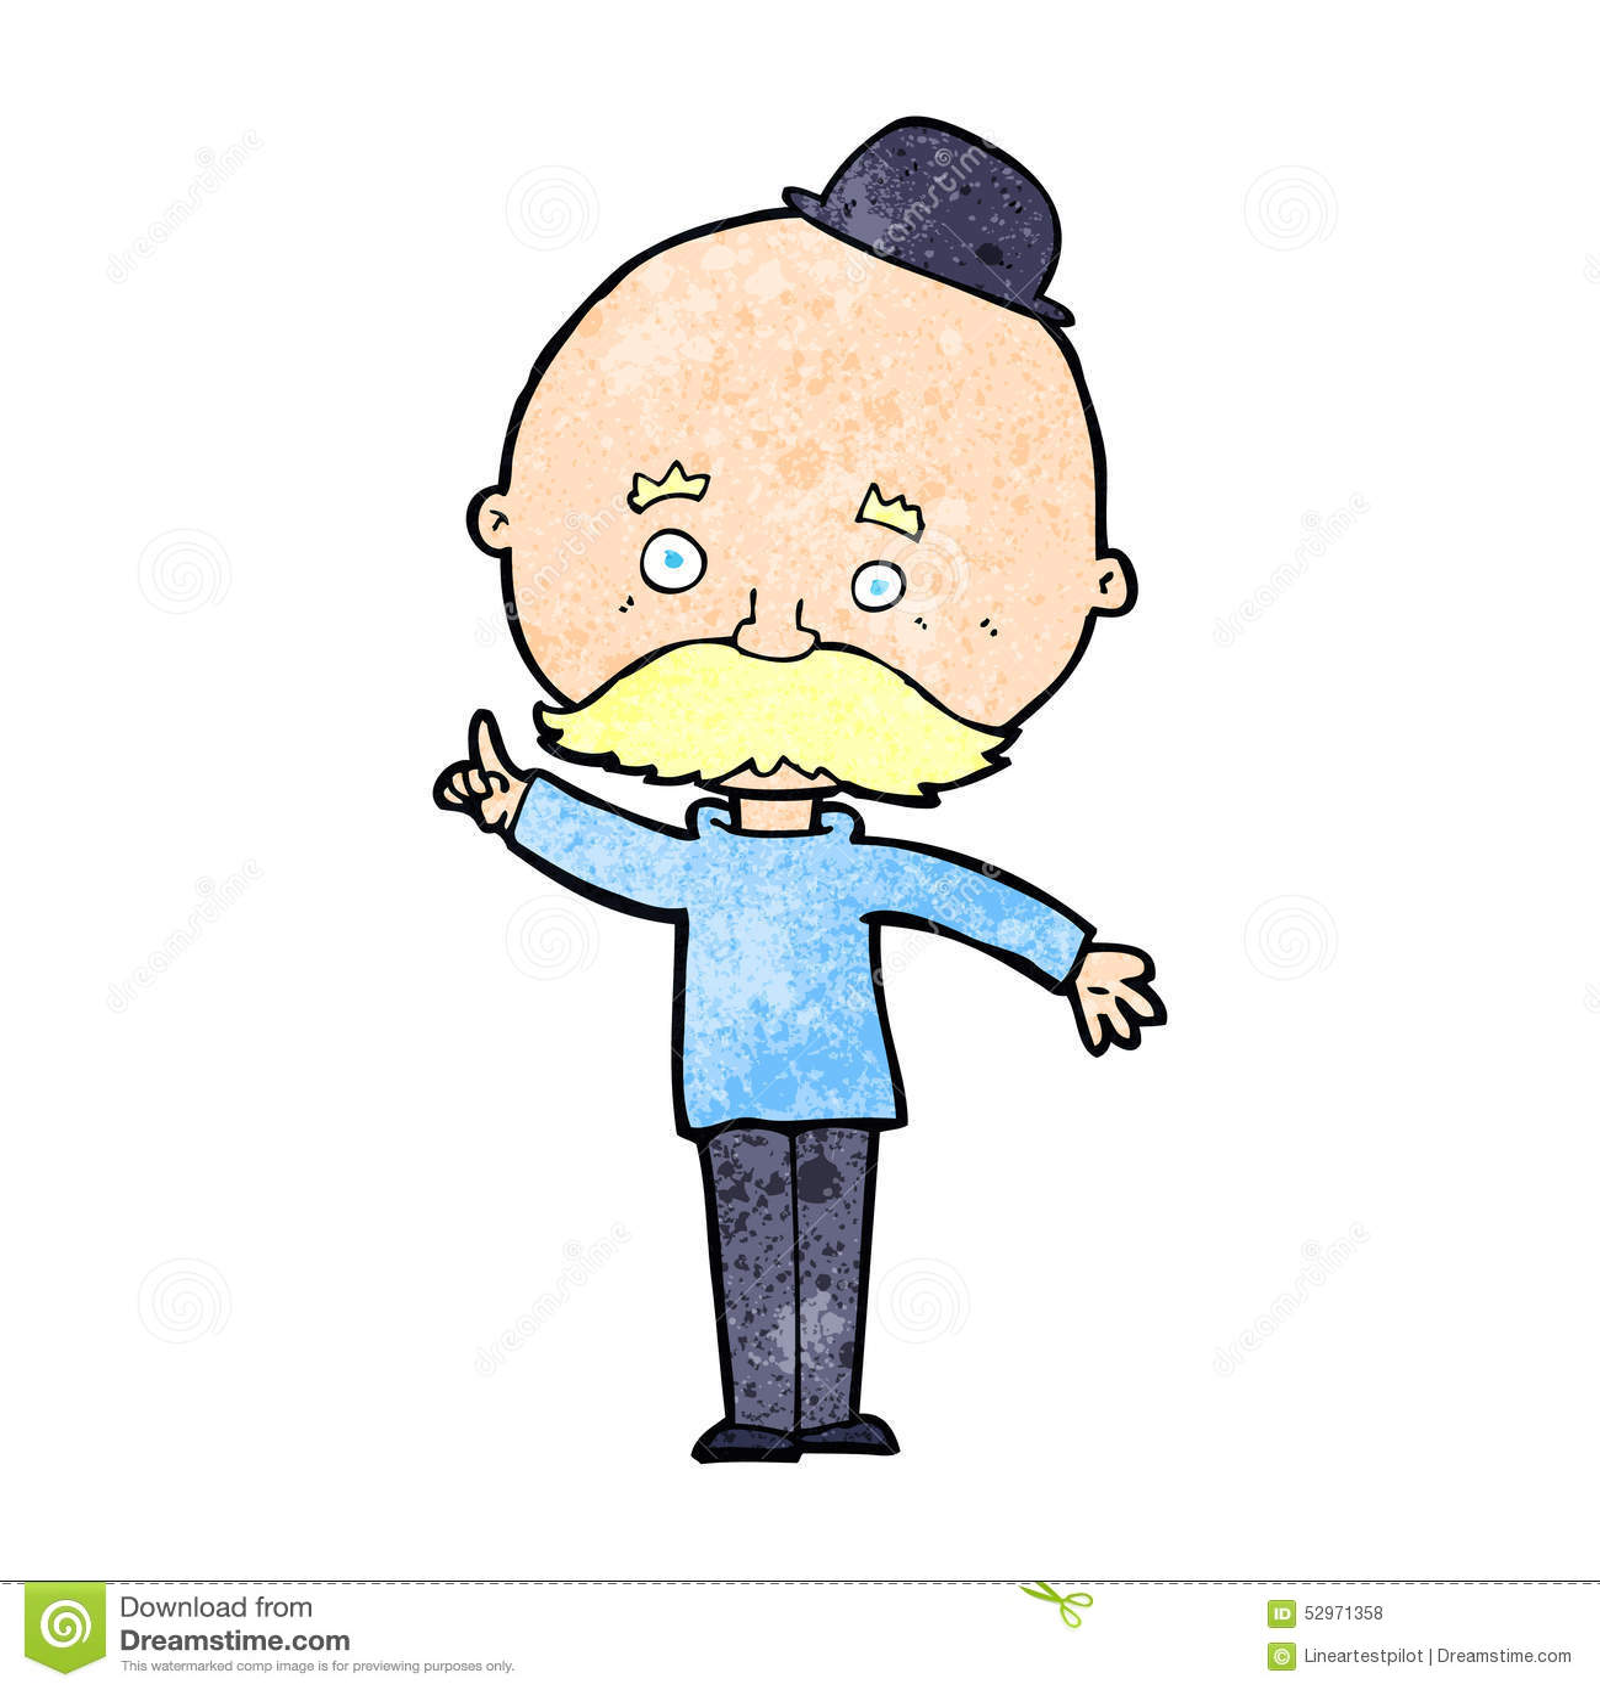 Cartoon Man In Bowler Hat Stock Illustration Illustration Of Retro